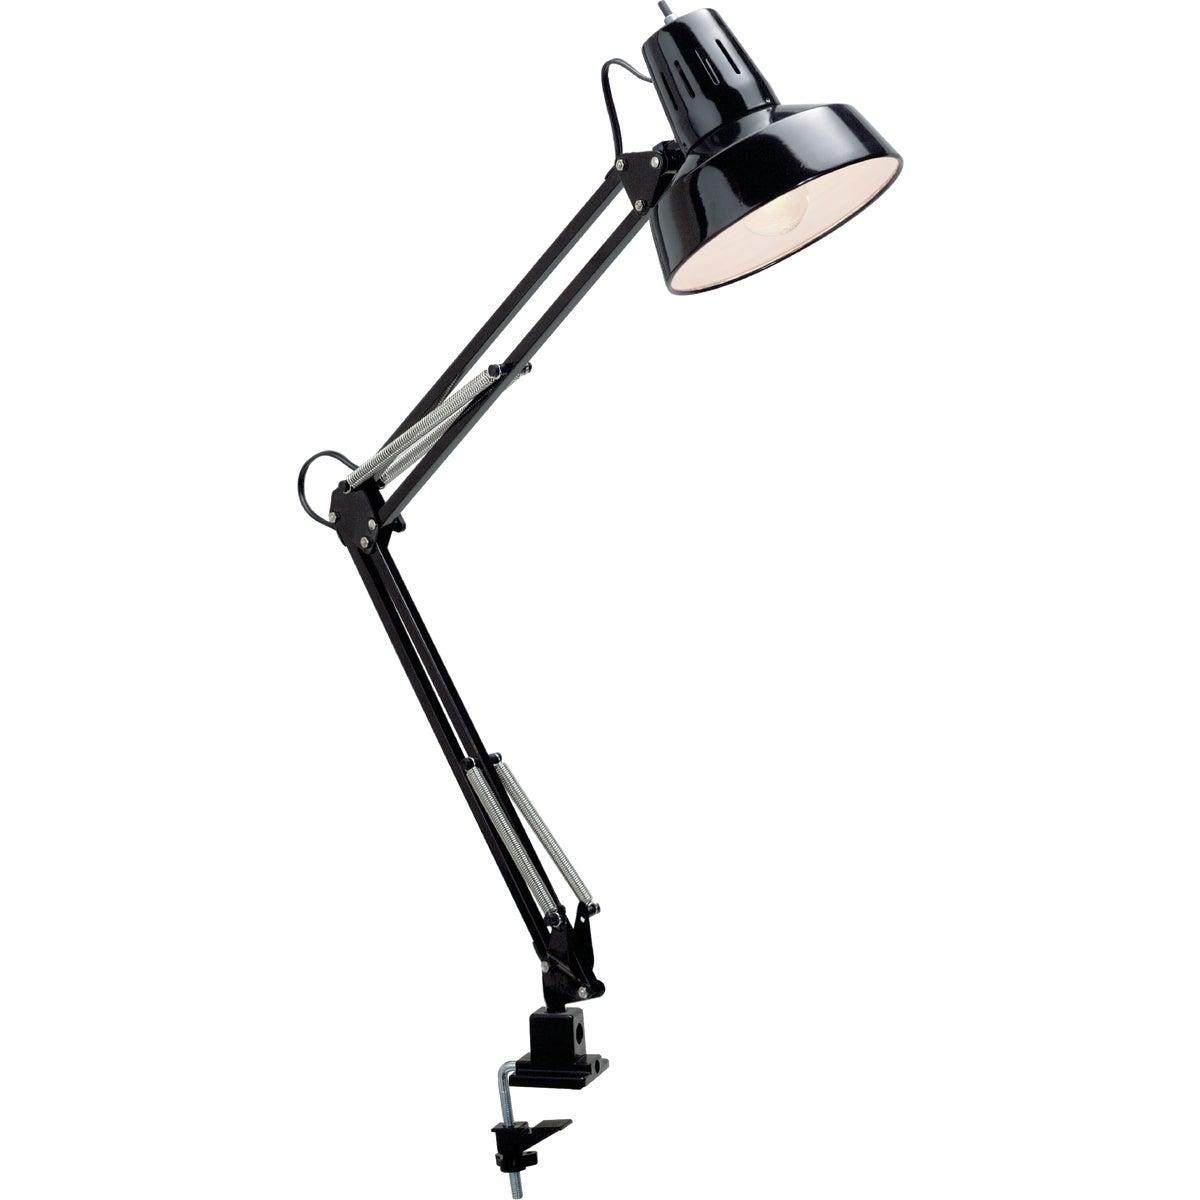 100W BLK SWINGARM LAMP - LS-105BLK by Lite Source